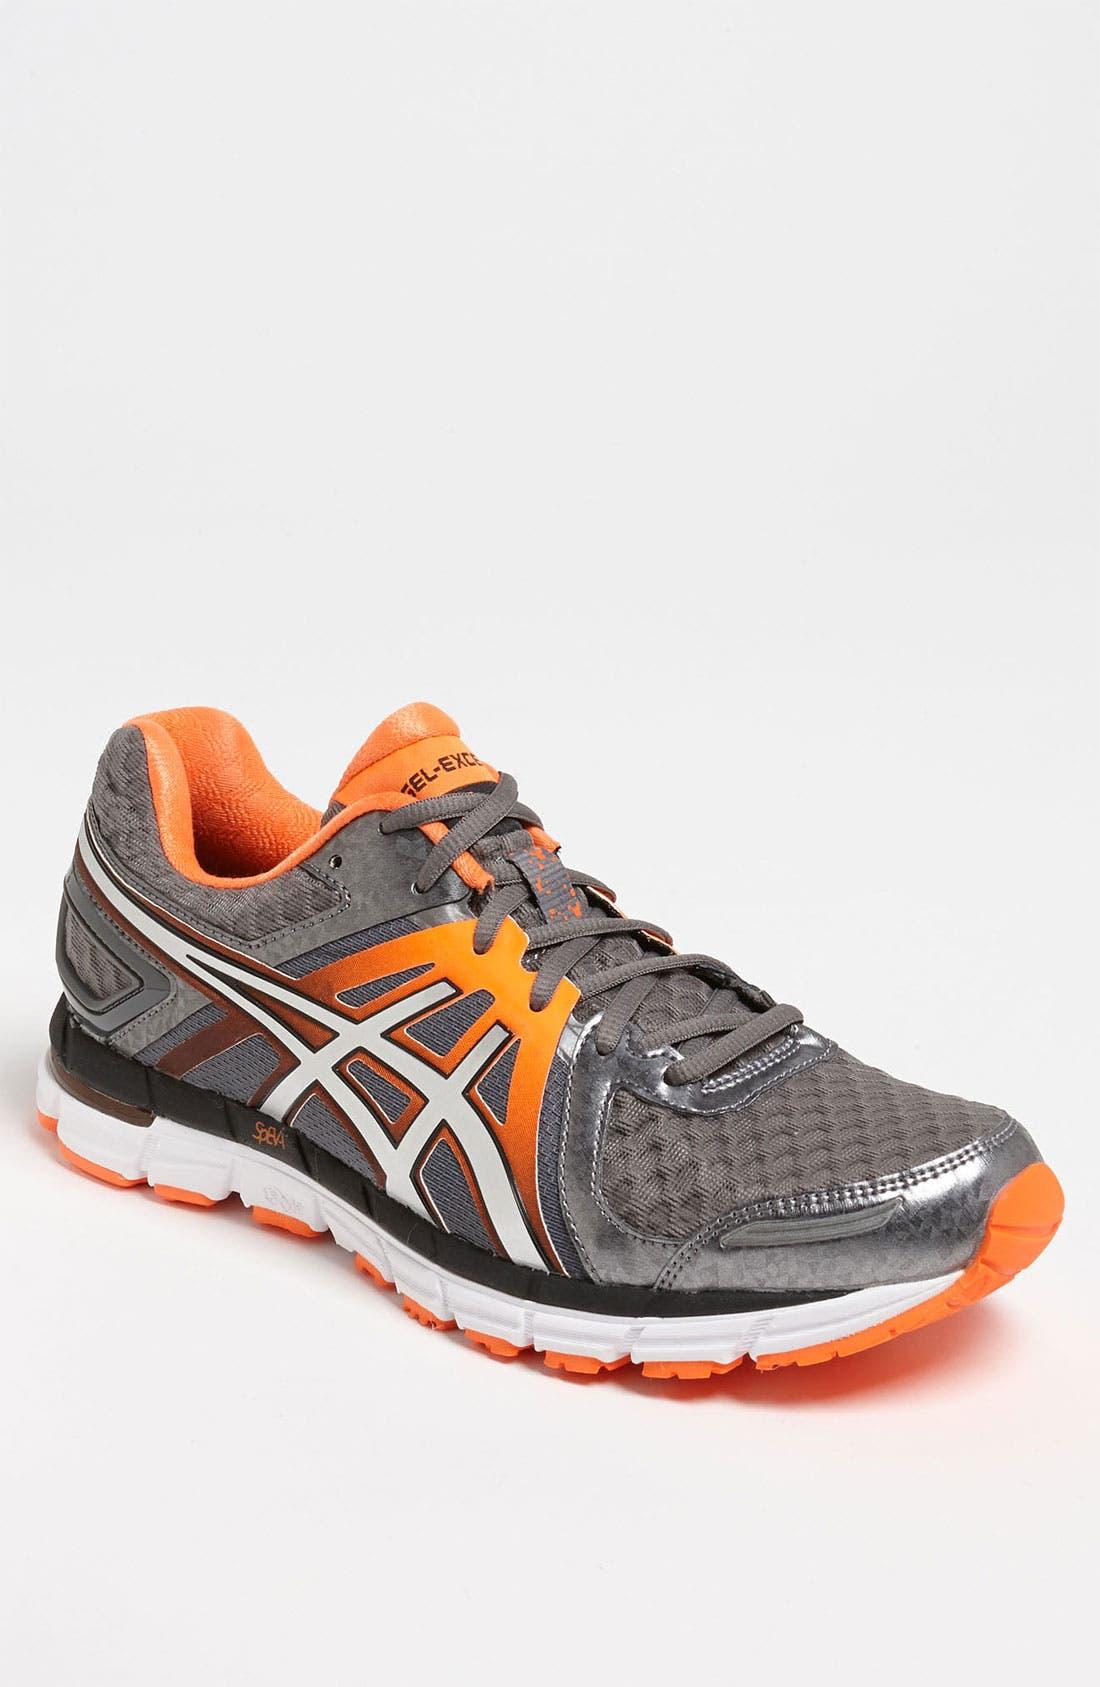 Main Image - ASICS® 'GEL-Excel 33' Running Shoe (Men)